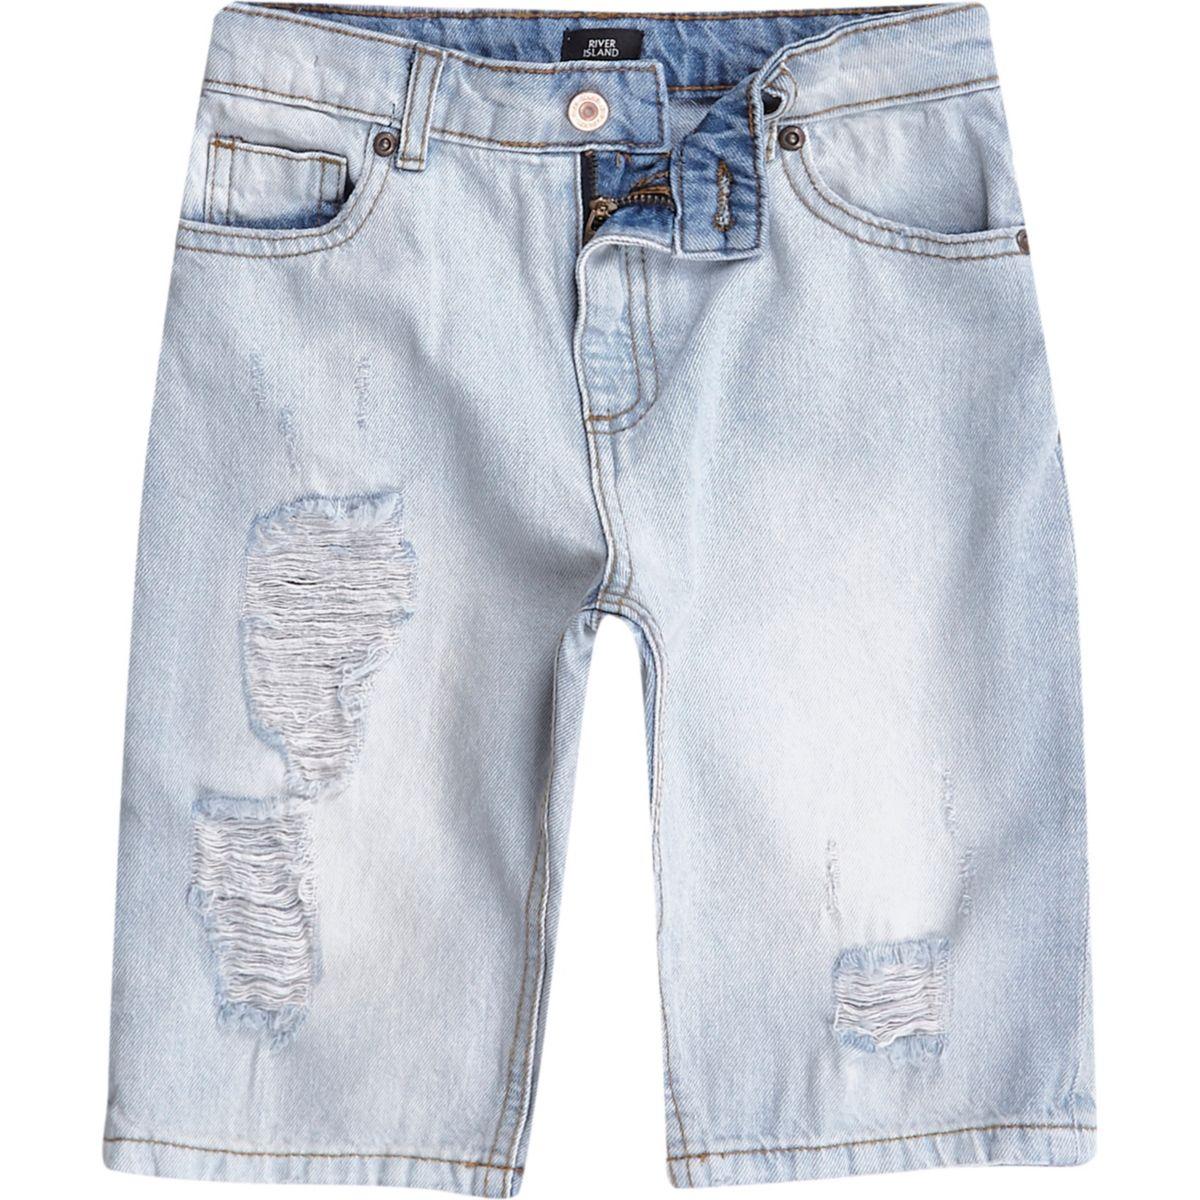 Boys blue washed ripped denim shorts